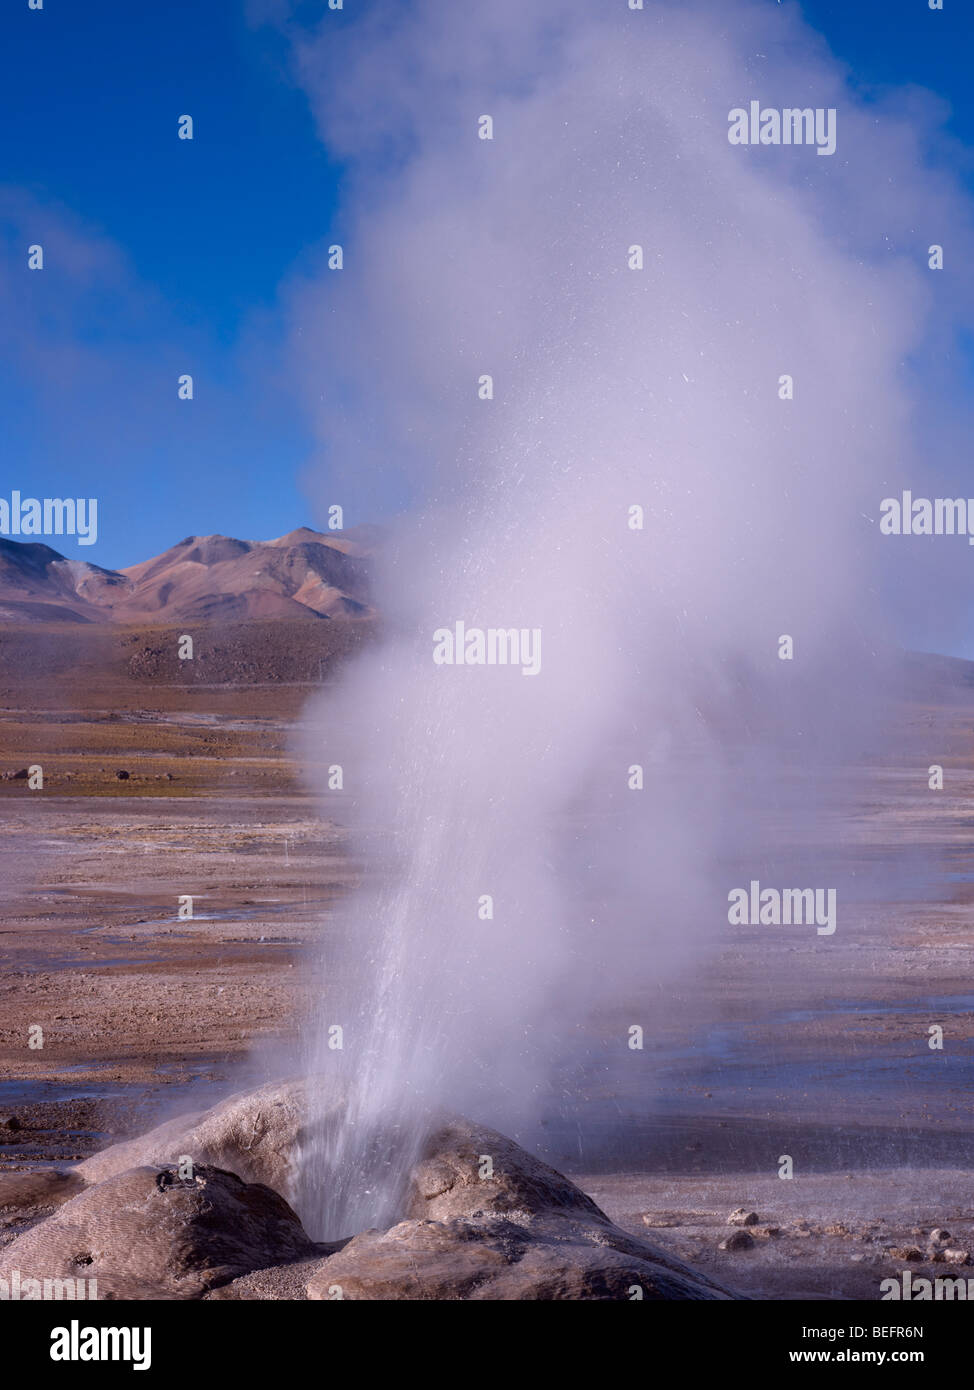 Eruption at Tatio Geysers, near San Pedro de Atacama in the Atacama Desert, Chile. - Stock Image